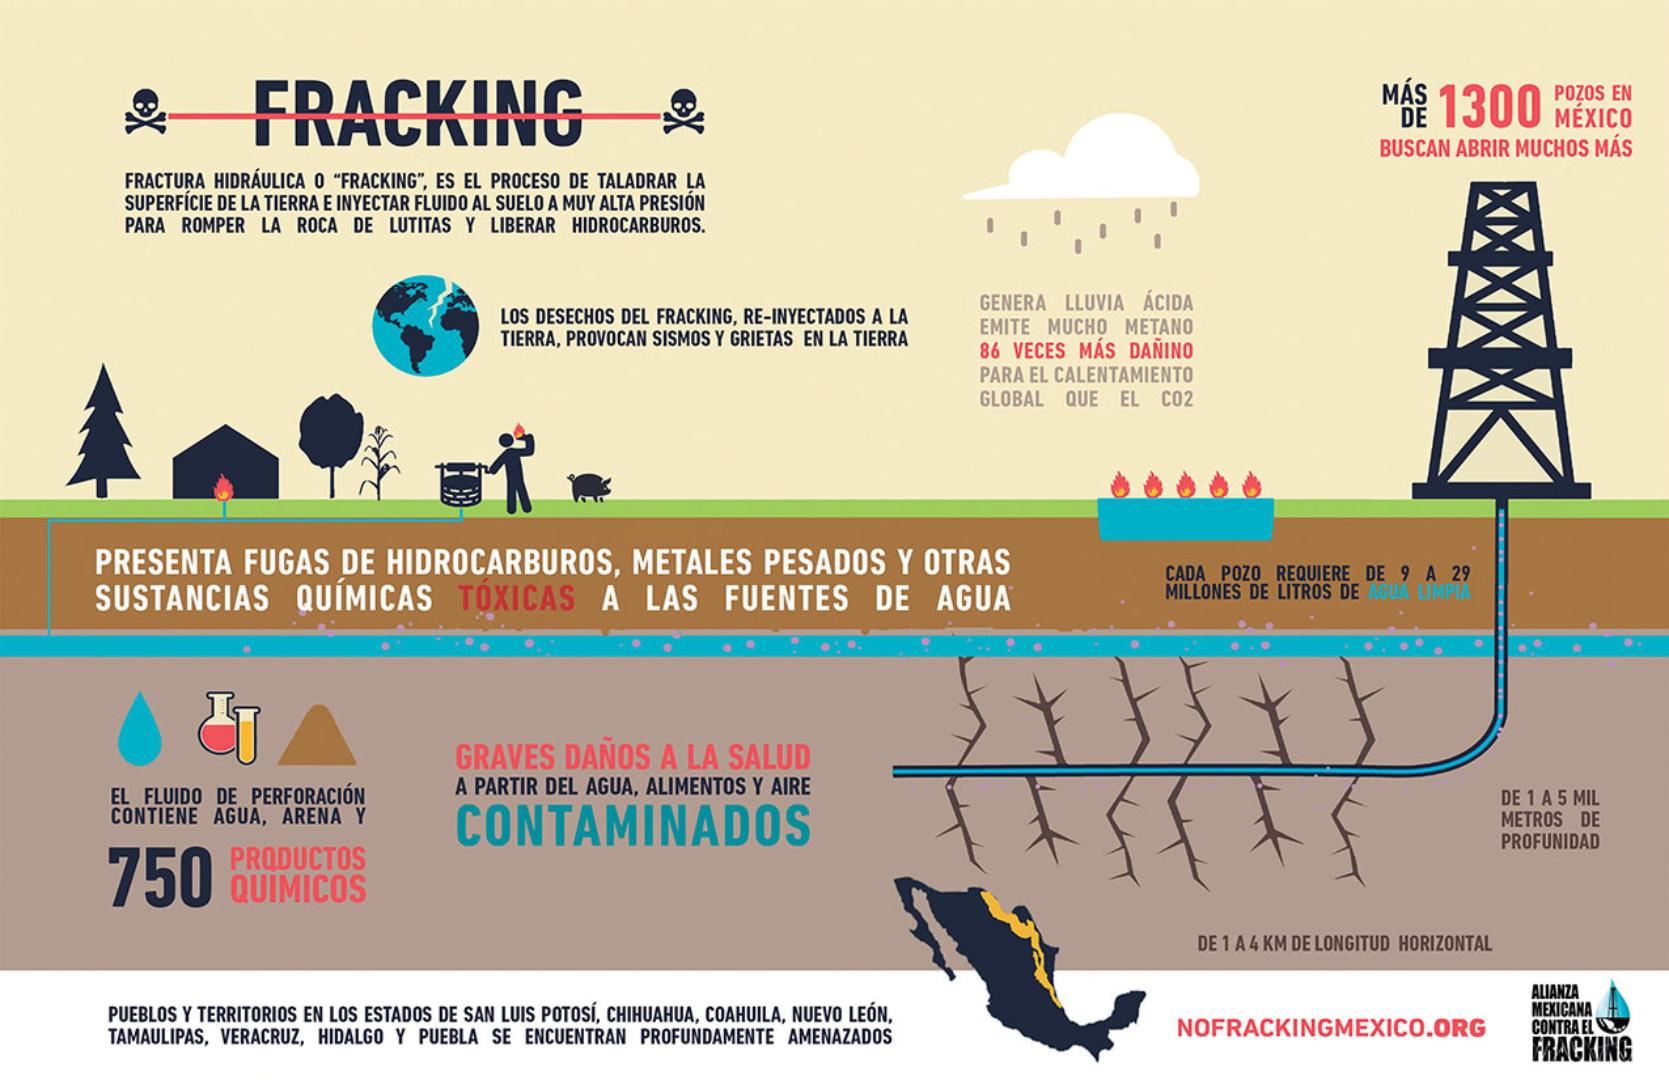 (Infografía: Alianza mexicana contra el fracking)